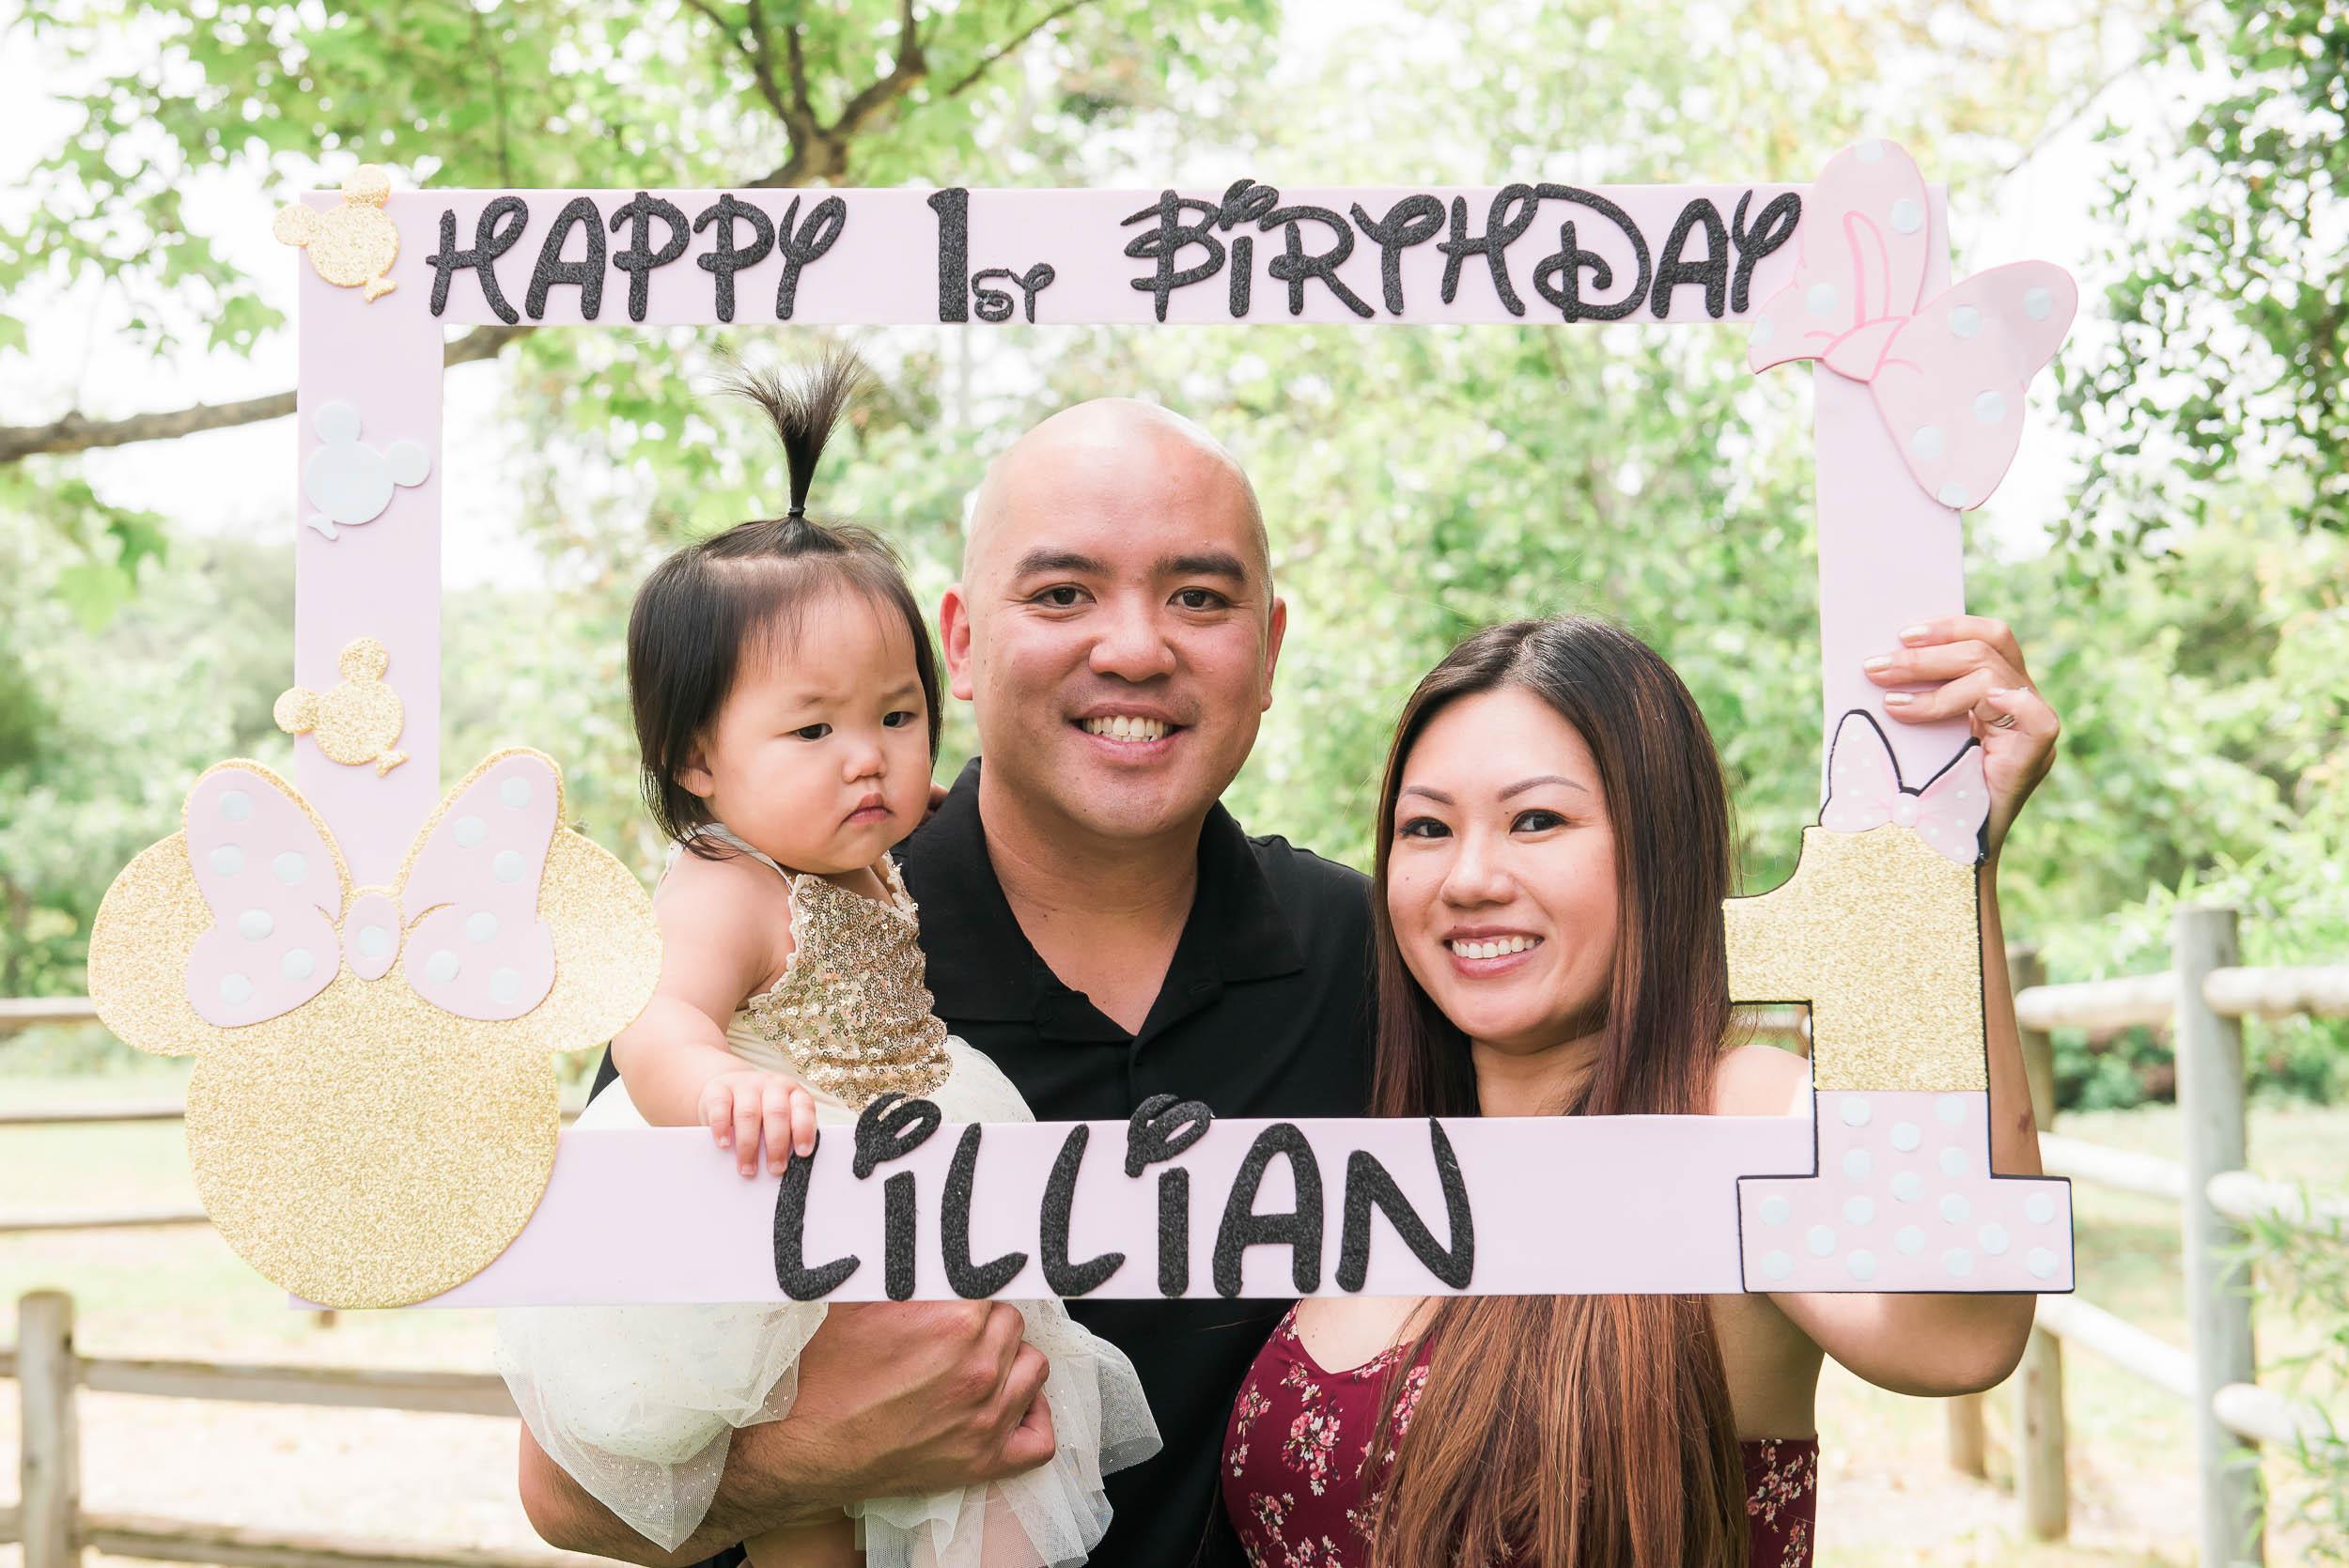 Bryan-Miraflor-Photography-Lillian's-1st-Birthday-Irvine-Railroad-Park-20170409-0004.jpg